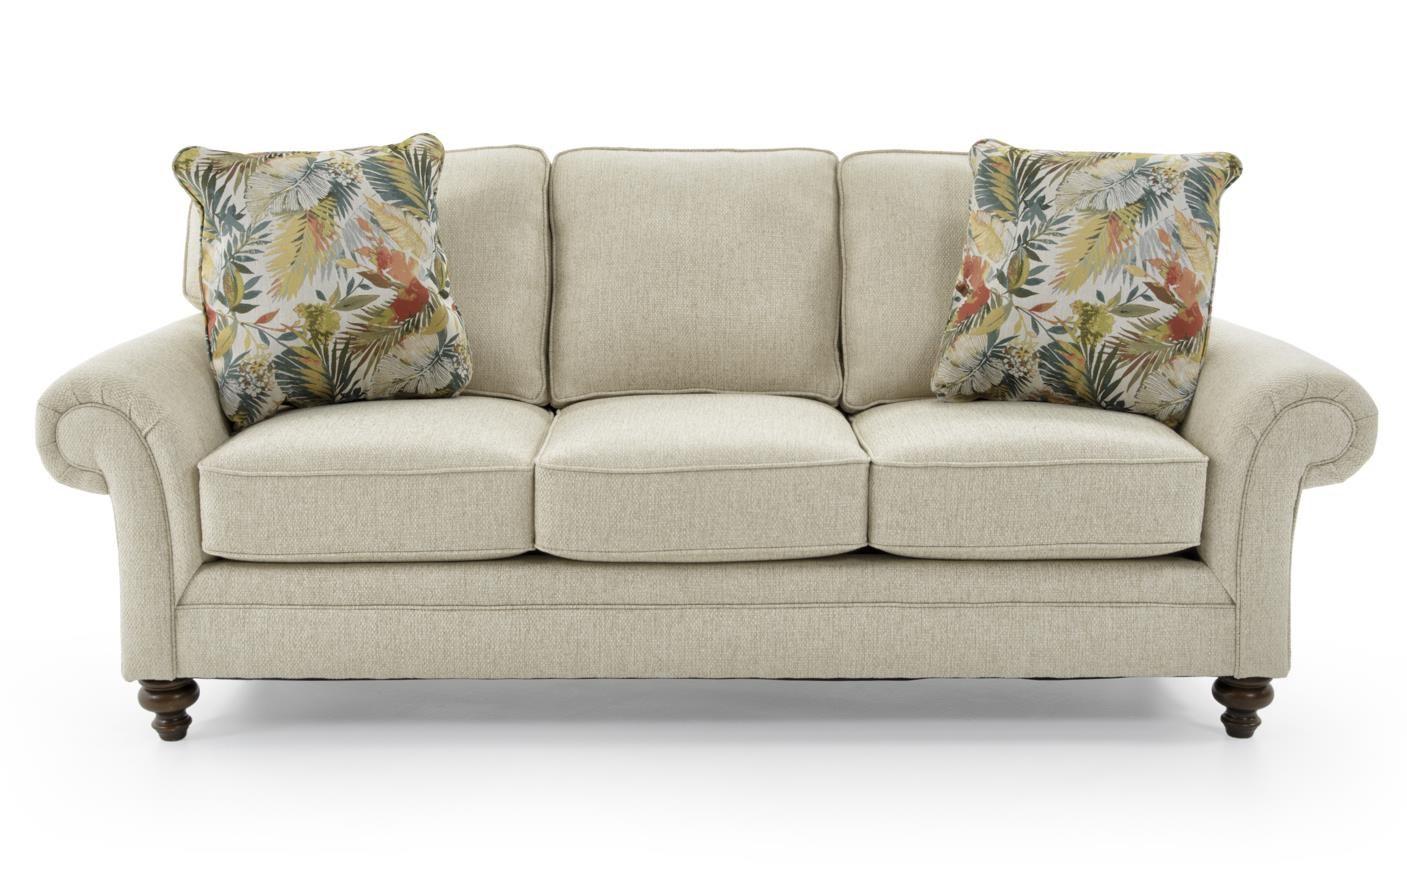 sleeper sofa miami fl reclining with chaise lazzaro leather reviews wayfair